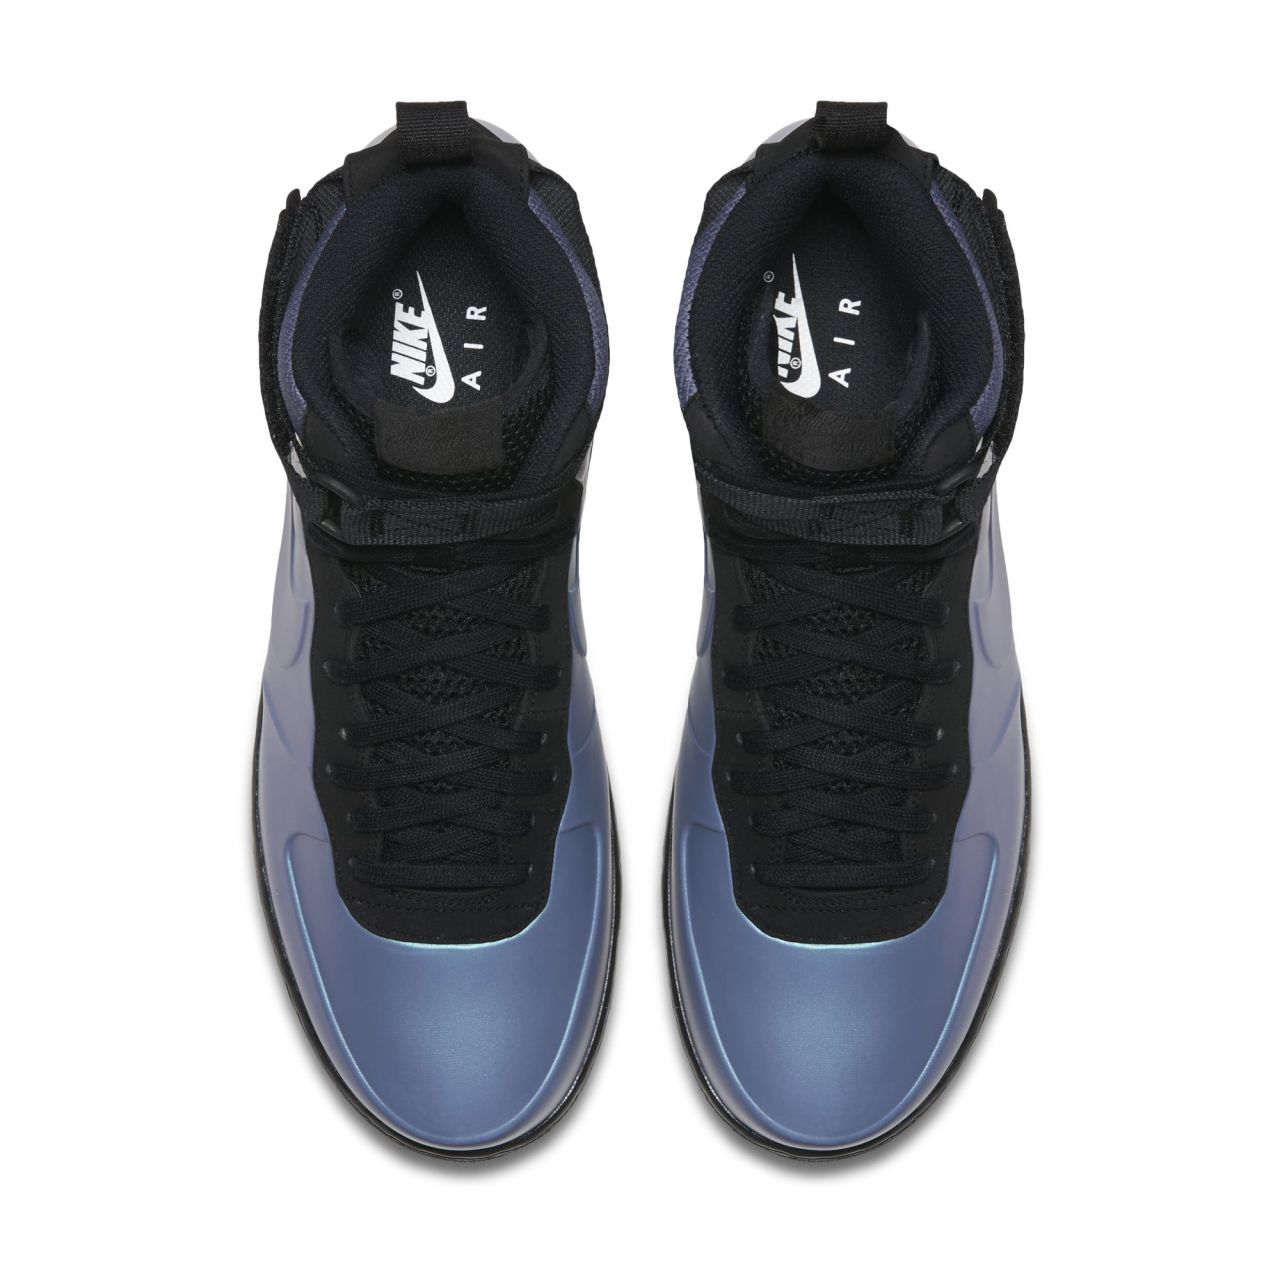 35dc20c56cf35 Nike Air Force 1 Foamposite returns this year